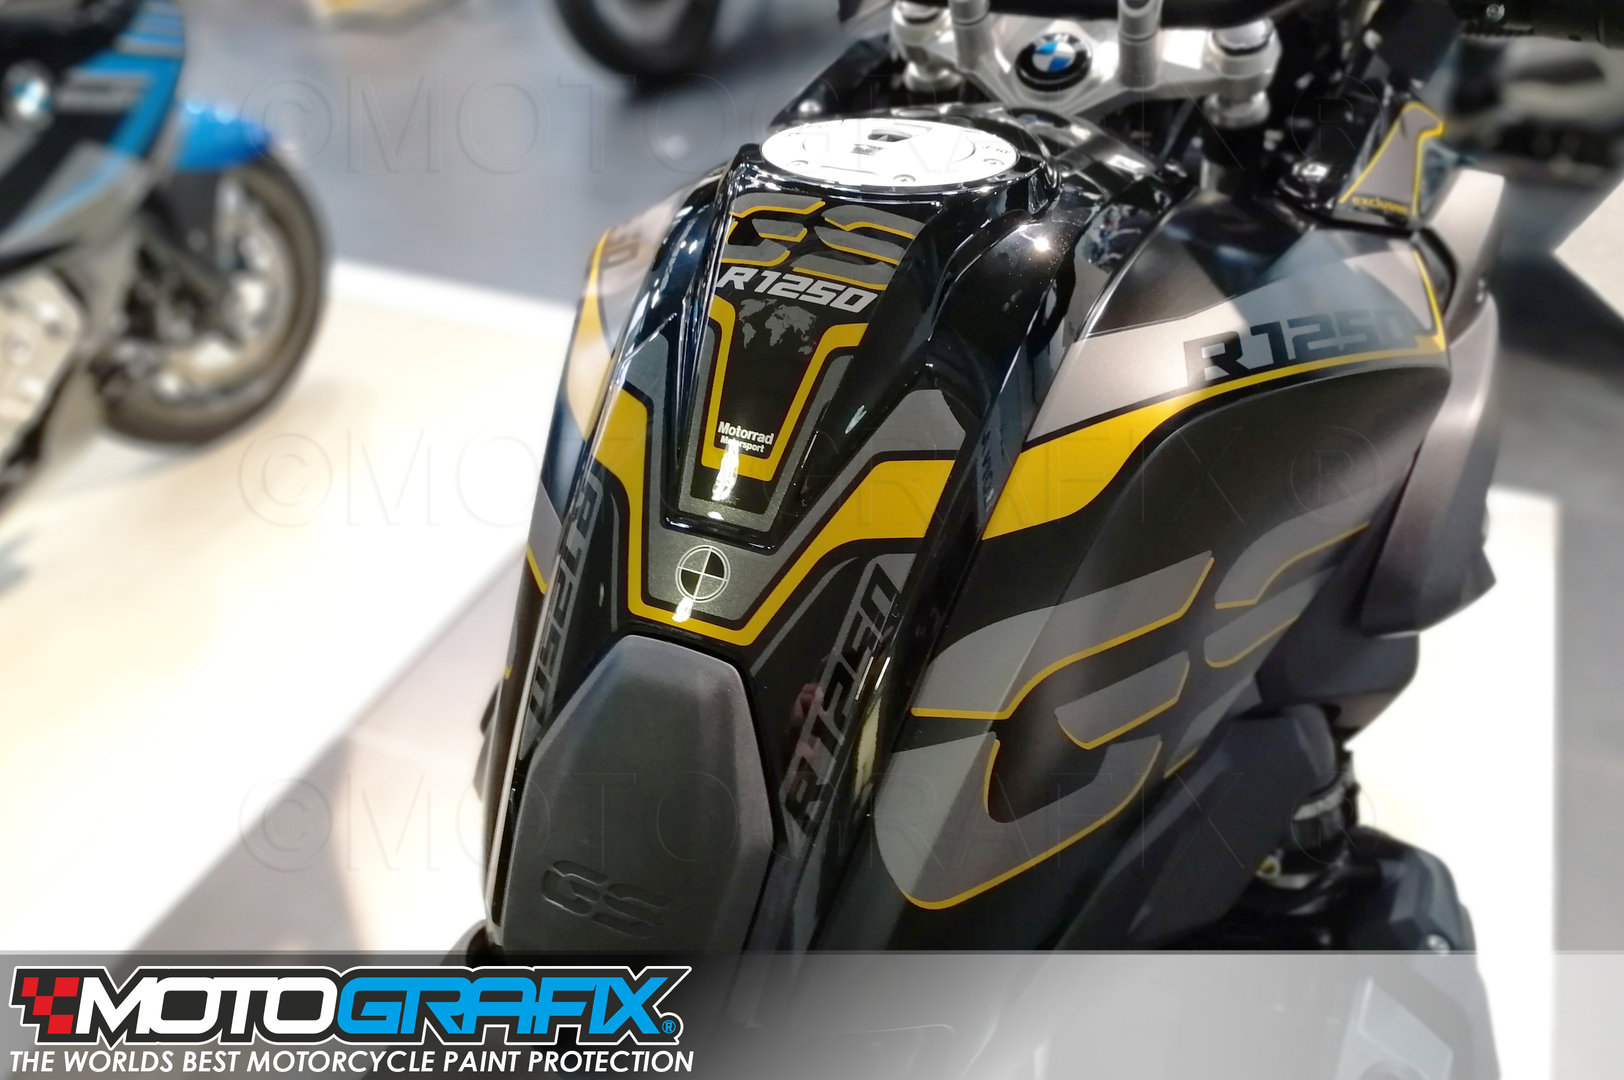 Bmw R1250gs 2018 2019 Black Motorcycle Tank Pad Protector Motografix 3d Gel Tb037ky